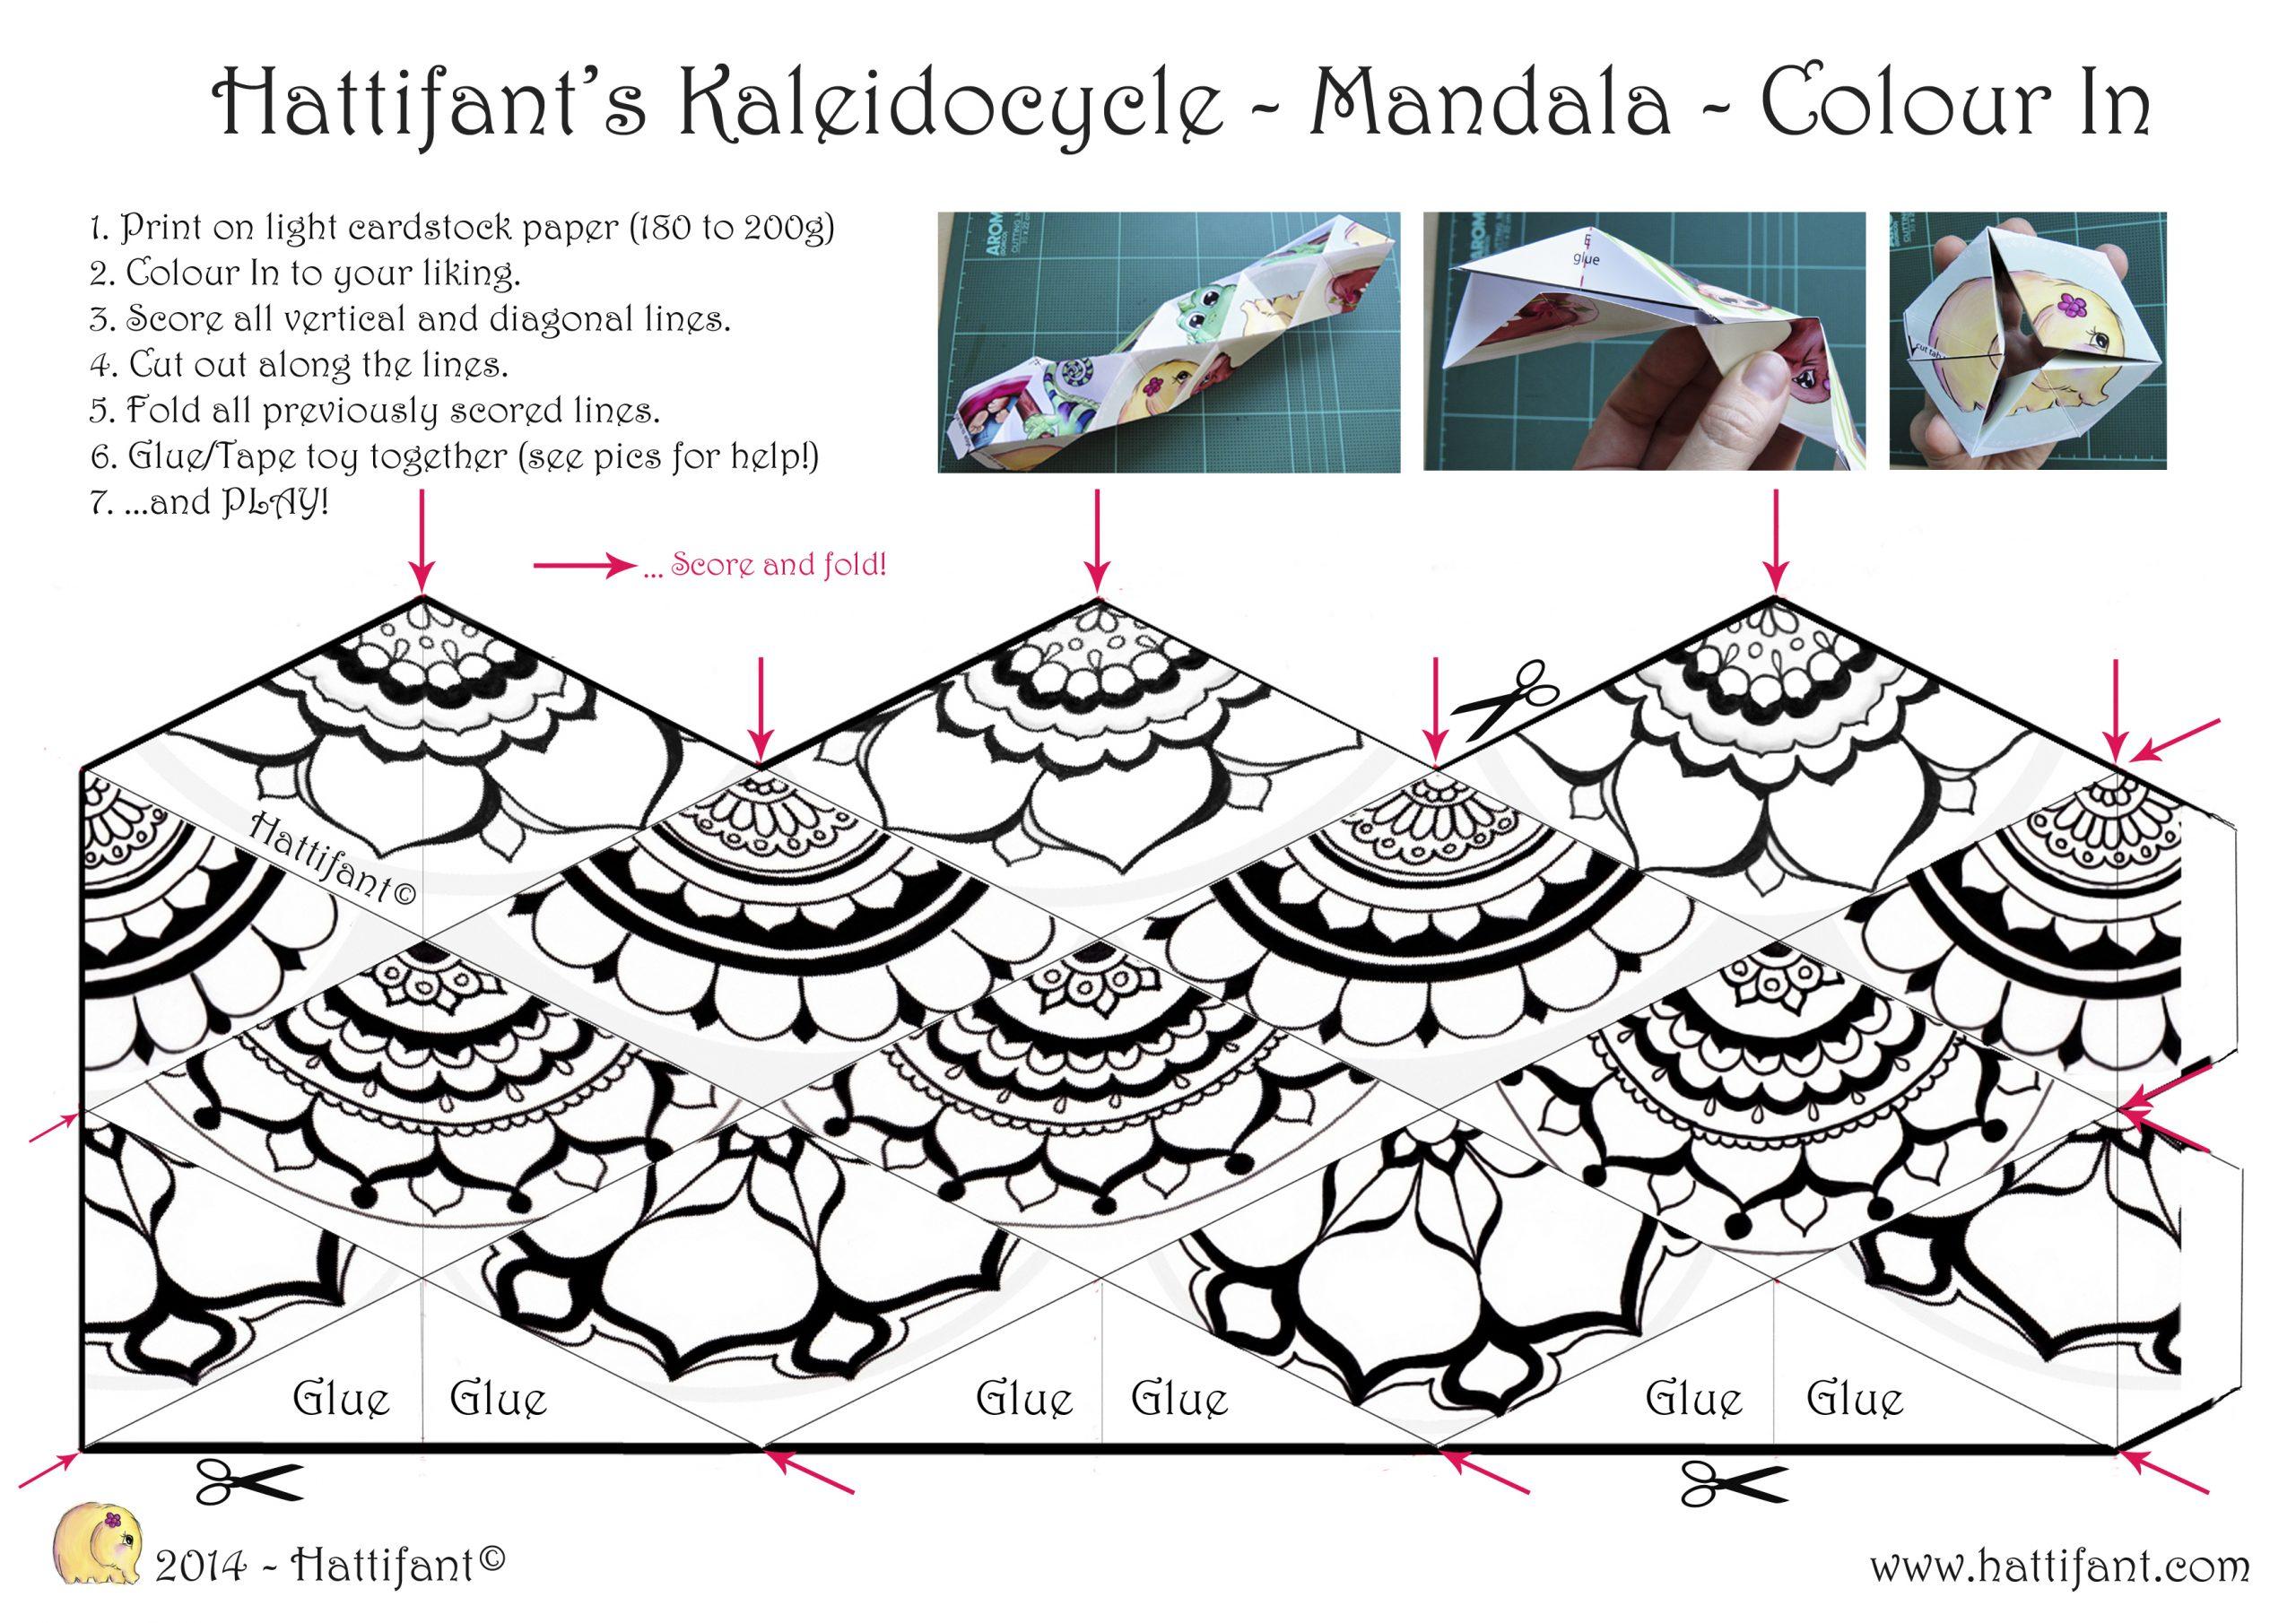 Hattifant's Kaleidocycle - Hattifant tout Paper Toy A Imprimer